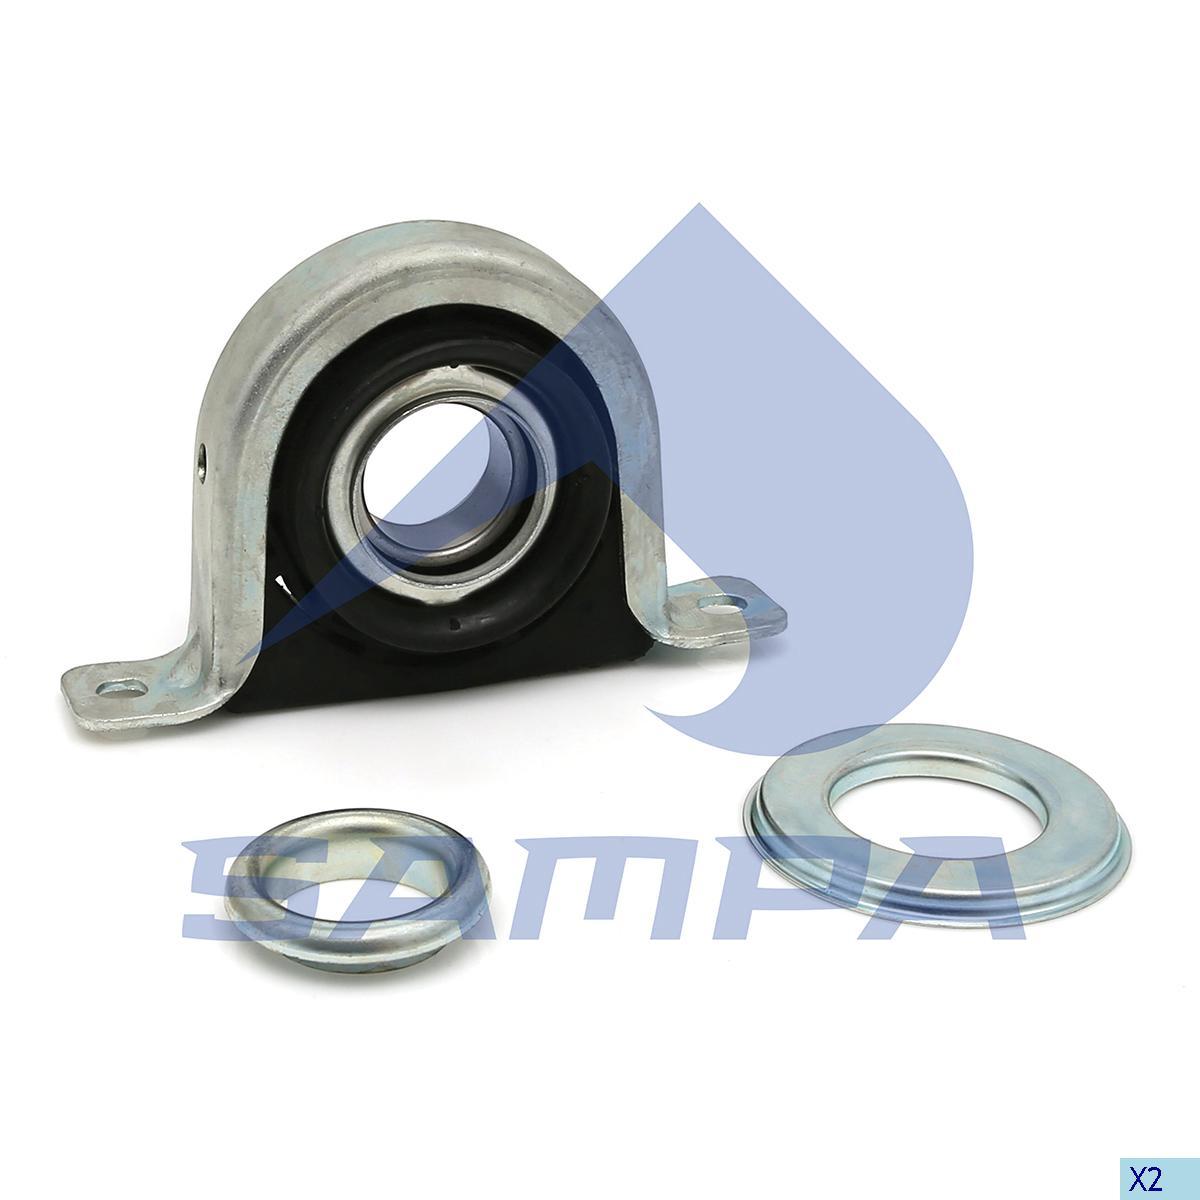 Propeller Shaft Bearing, Iveco, Propeller Shaft